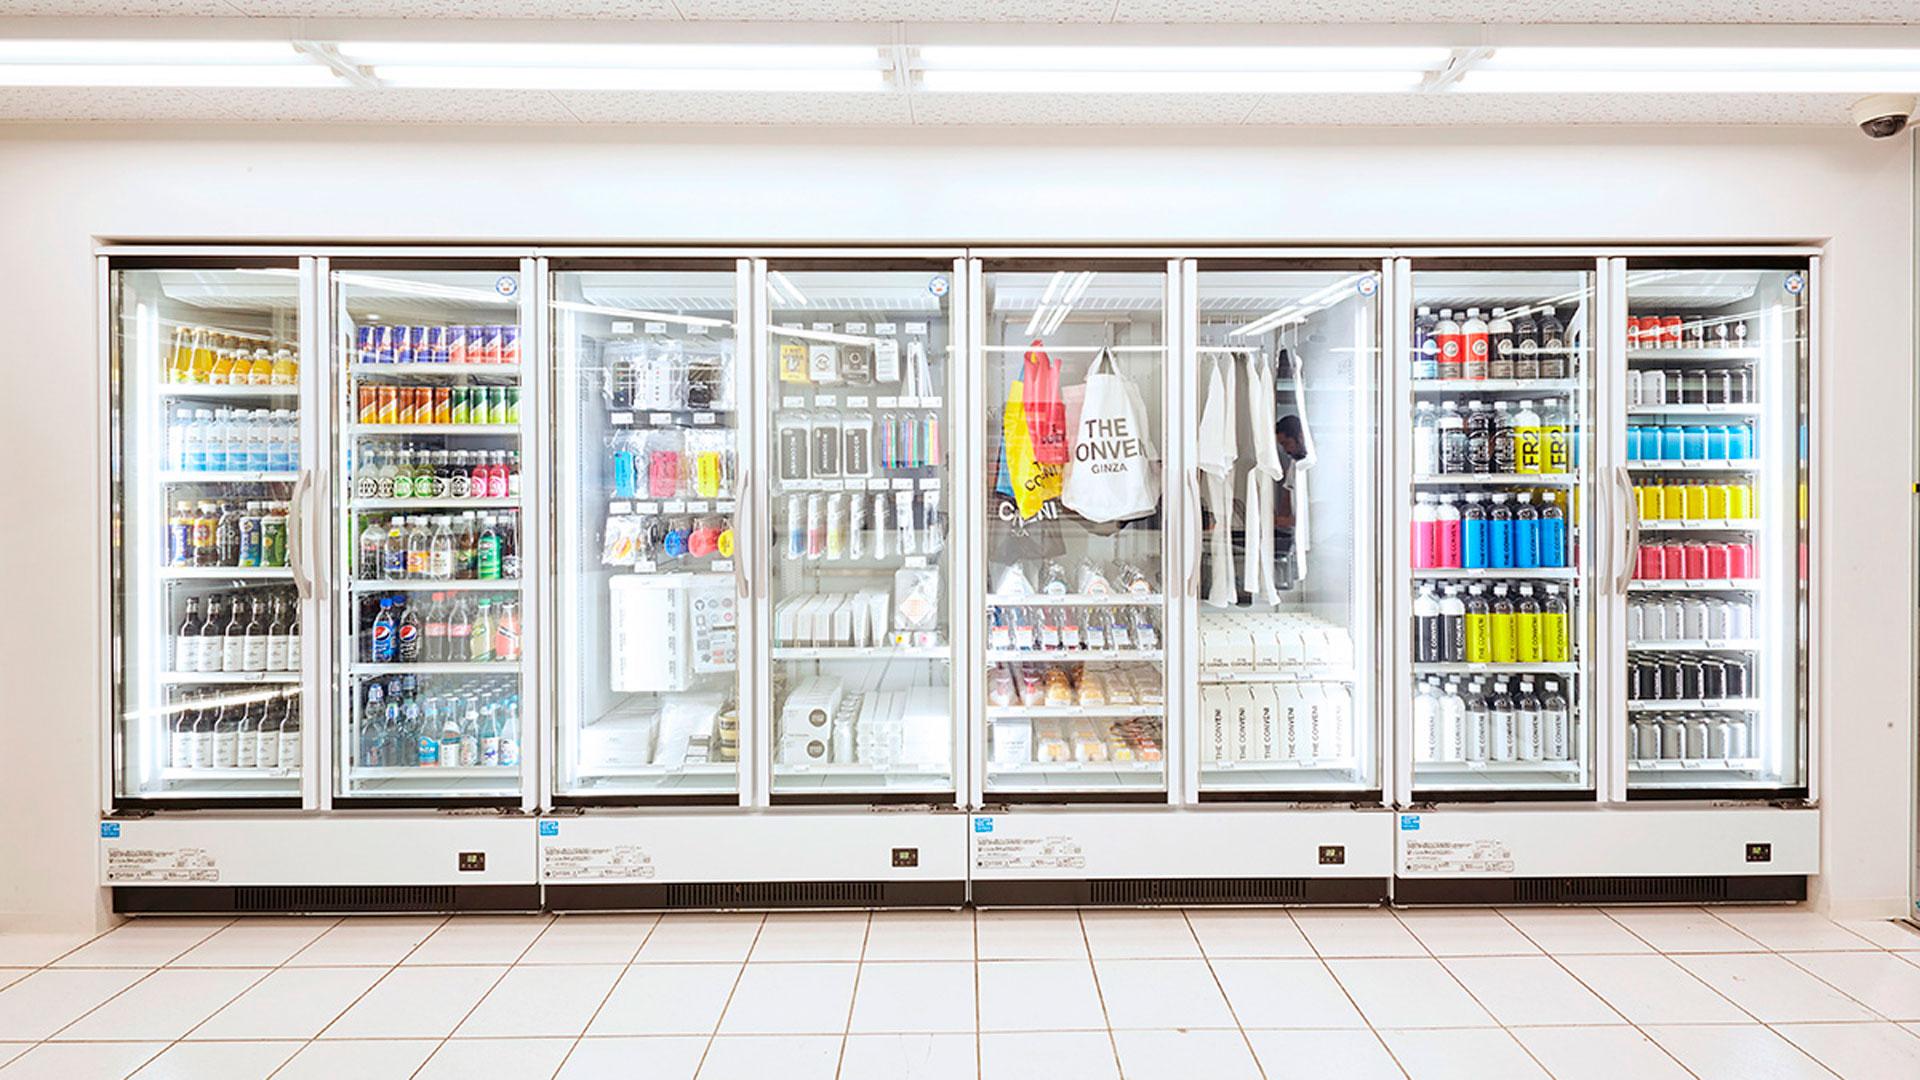 Conveni Concept Store hero asset